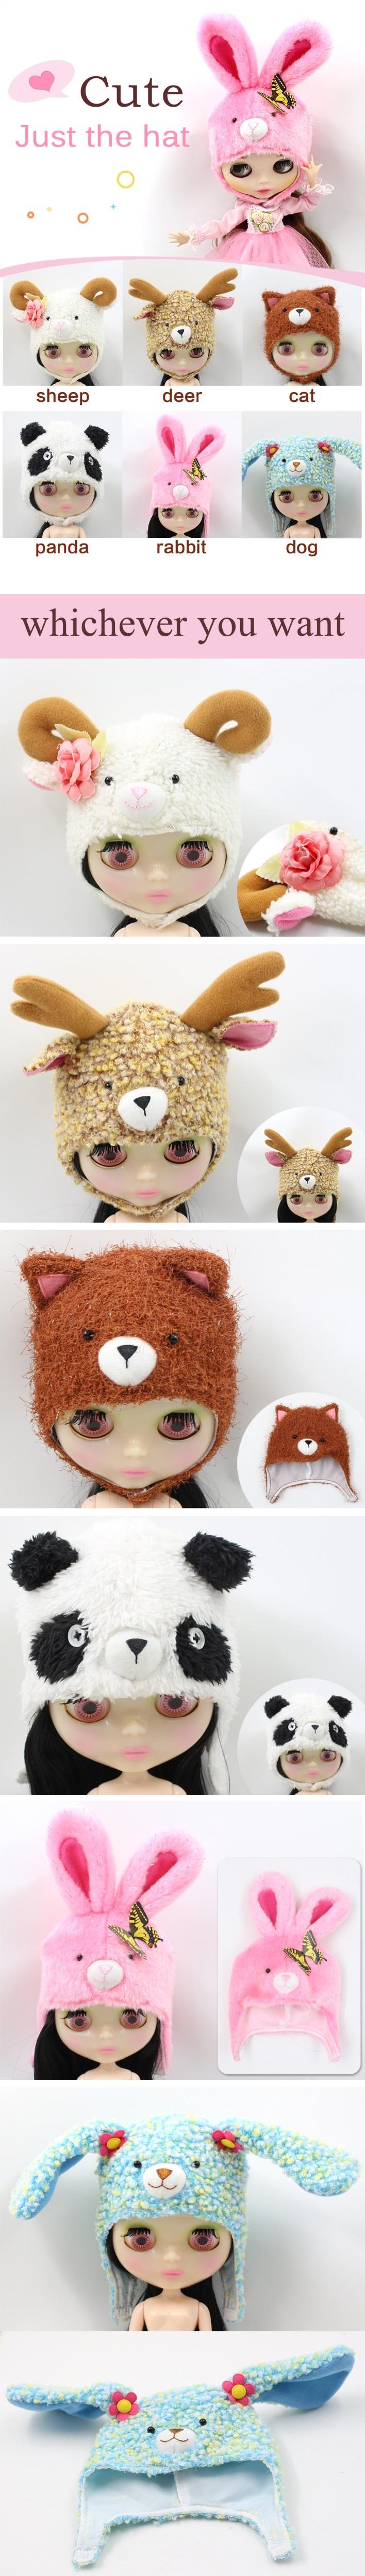 Neo Blythe Doll Animal Hat 1